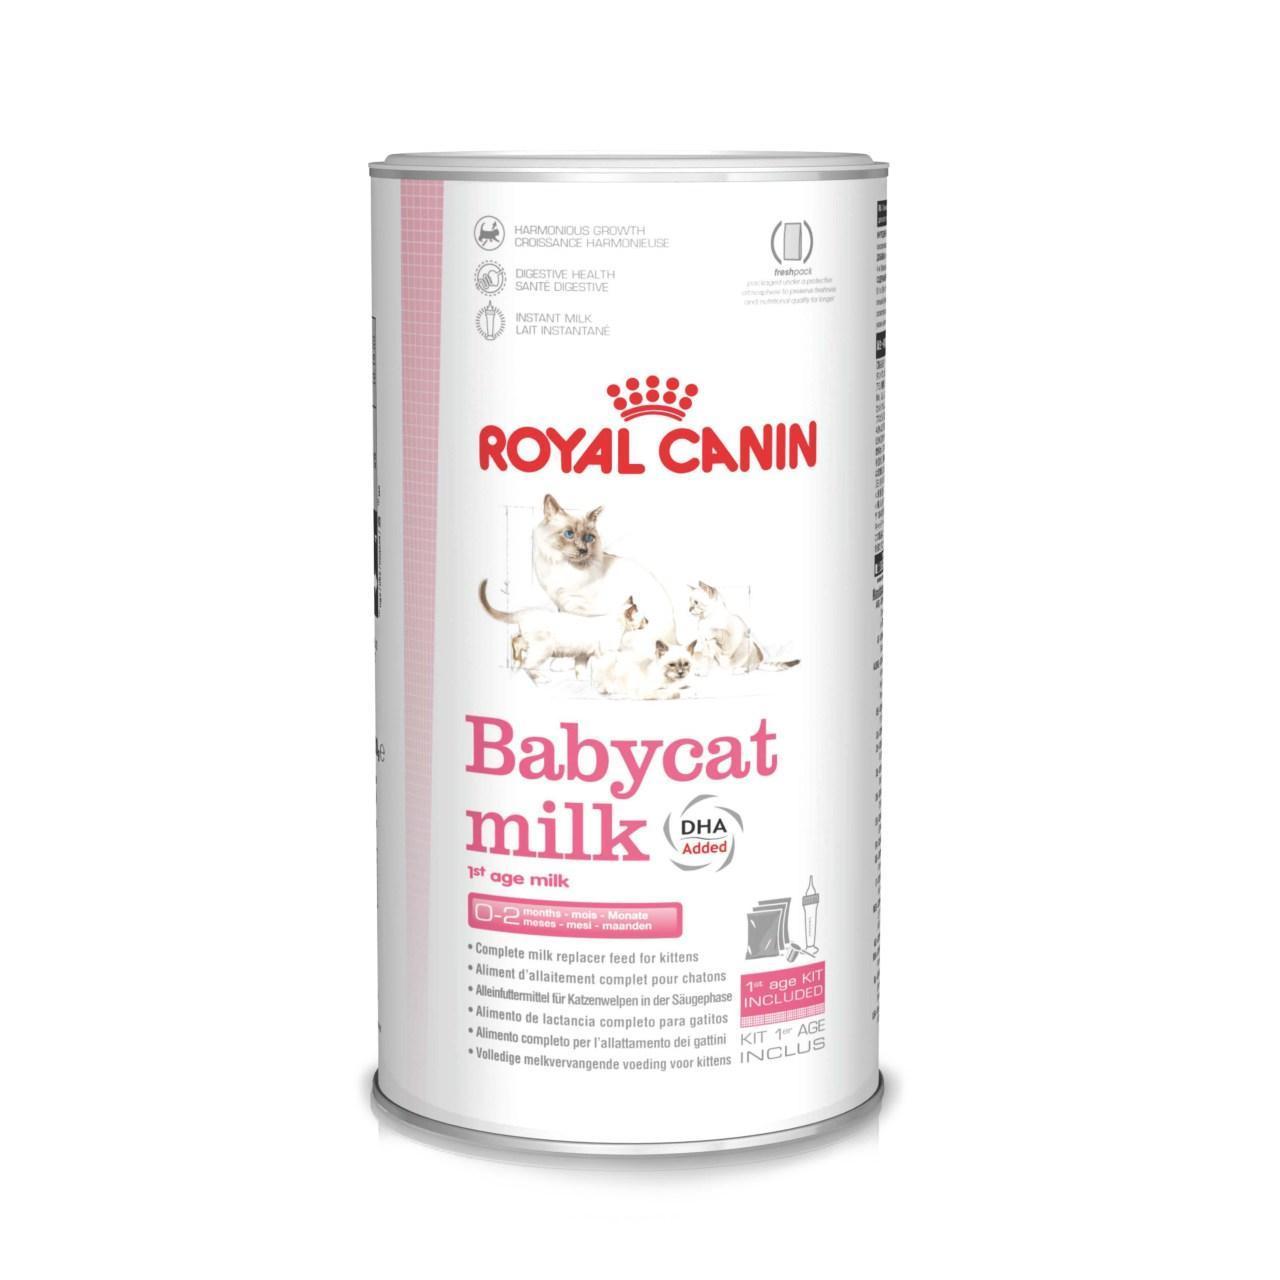 royal canin babycat milk 300g at the online pet store. Black Bedroom Furniture Sets. Home Design Ideas